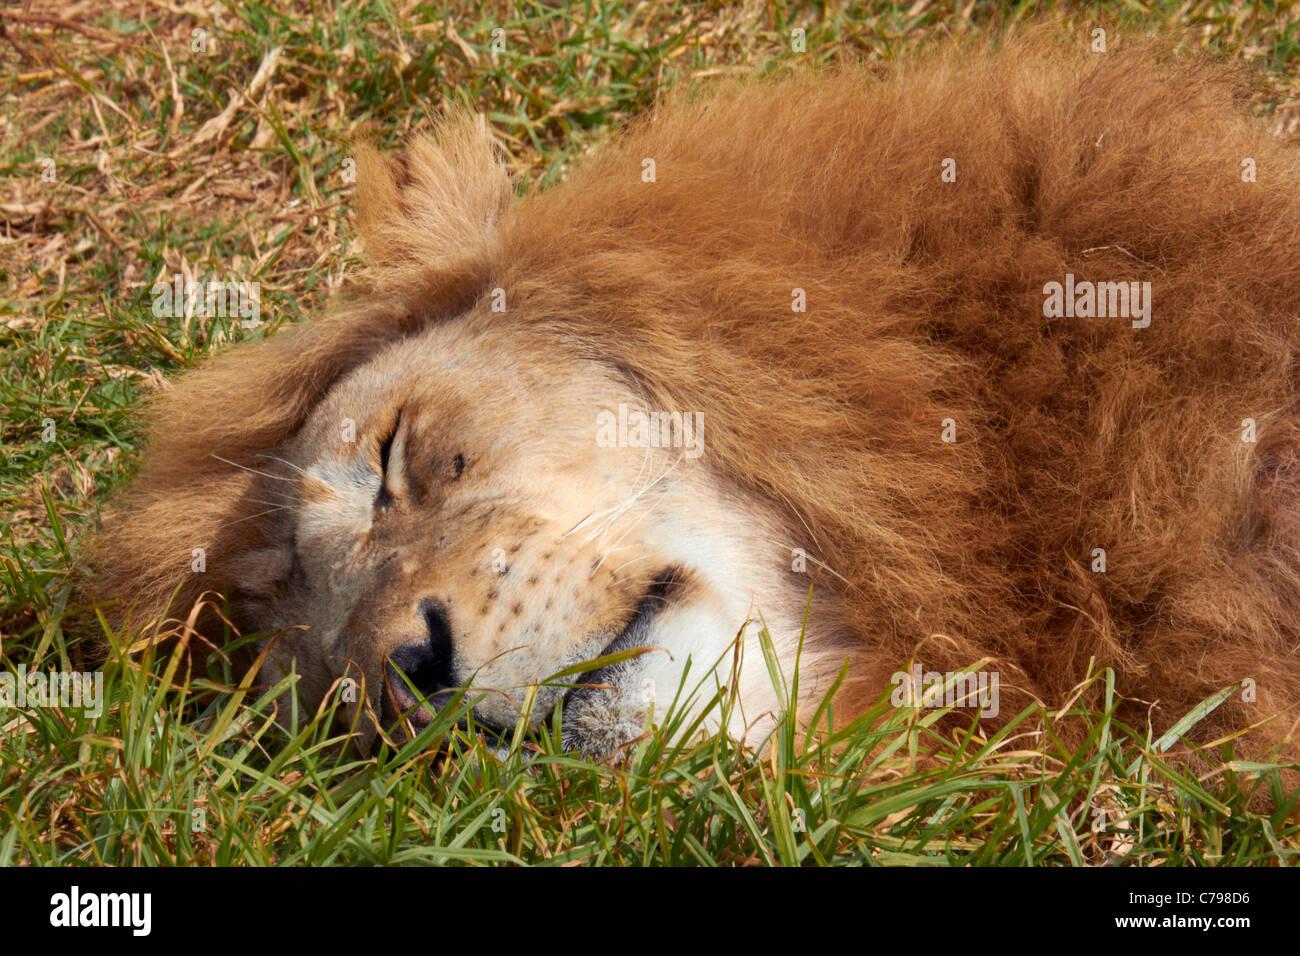 Sleeping lion in Natal Lion Park, near Pietermaritzburg, KwaZulu-Natal, South Africa. - Stock Image